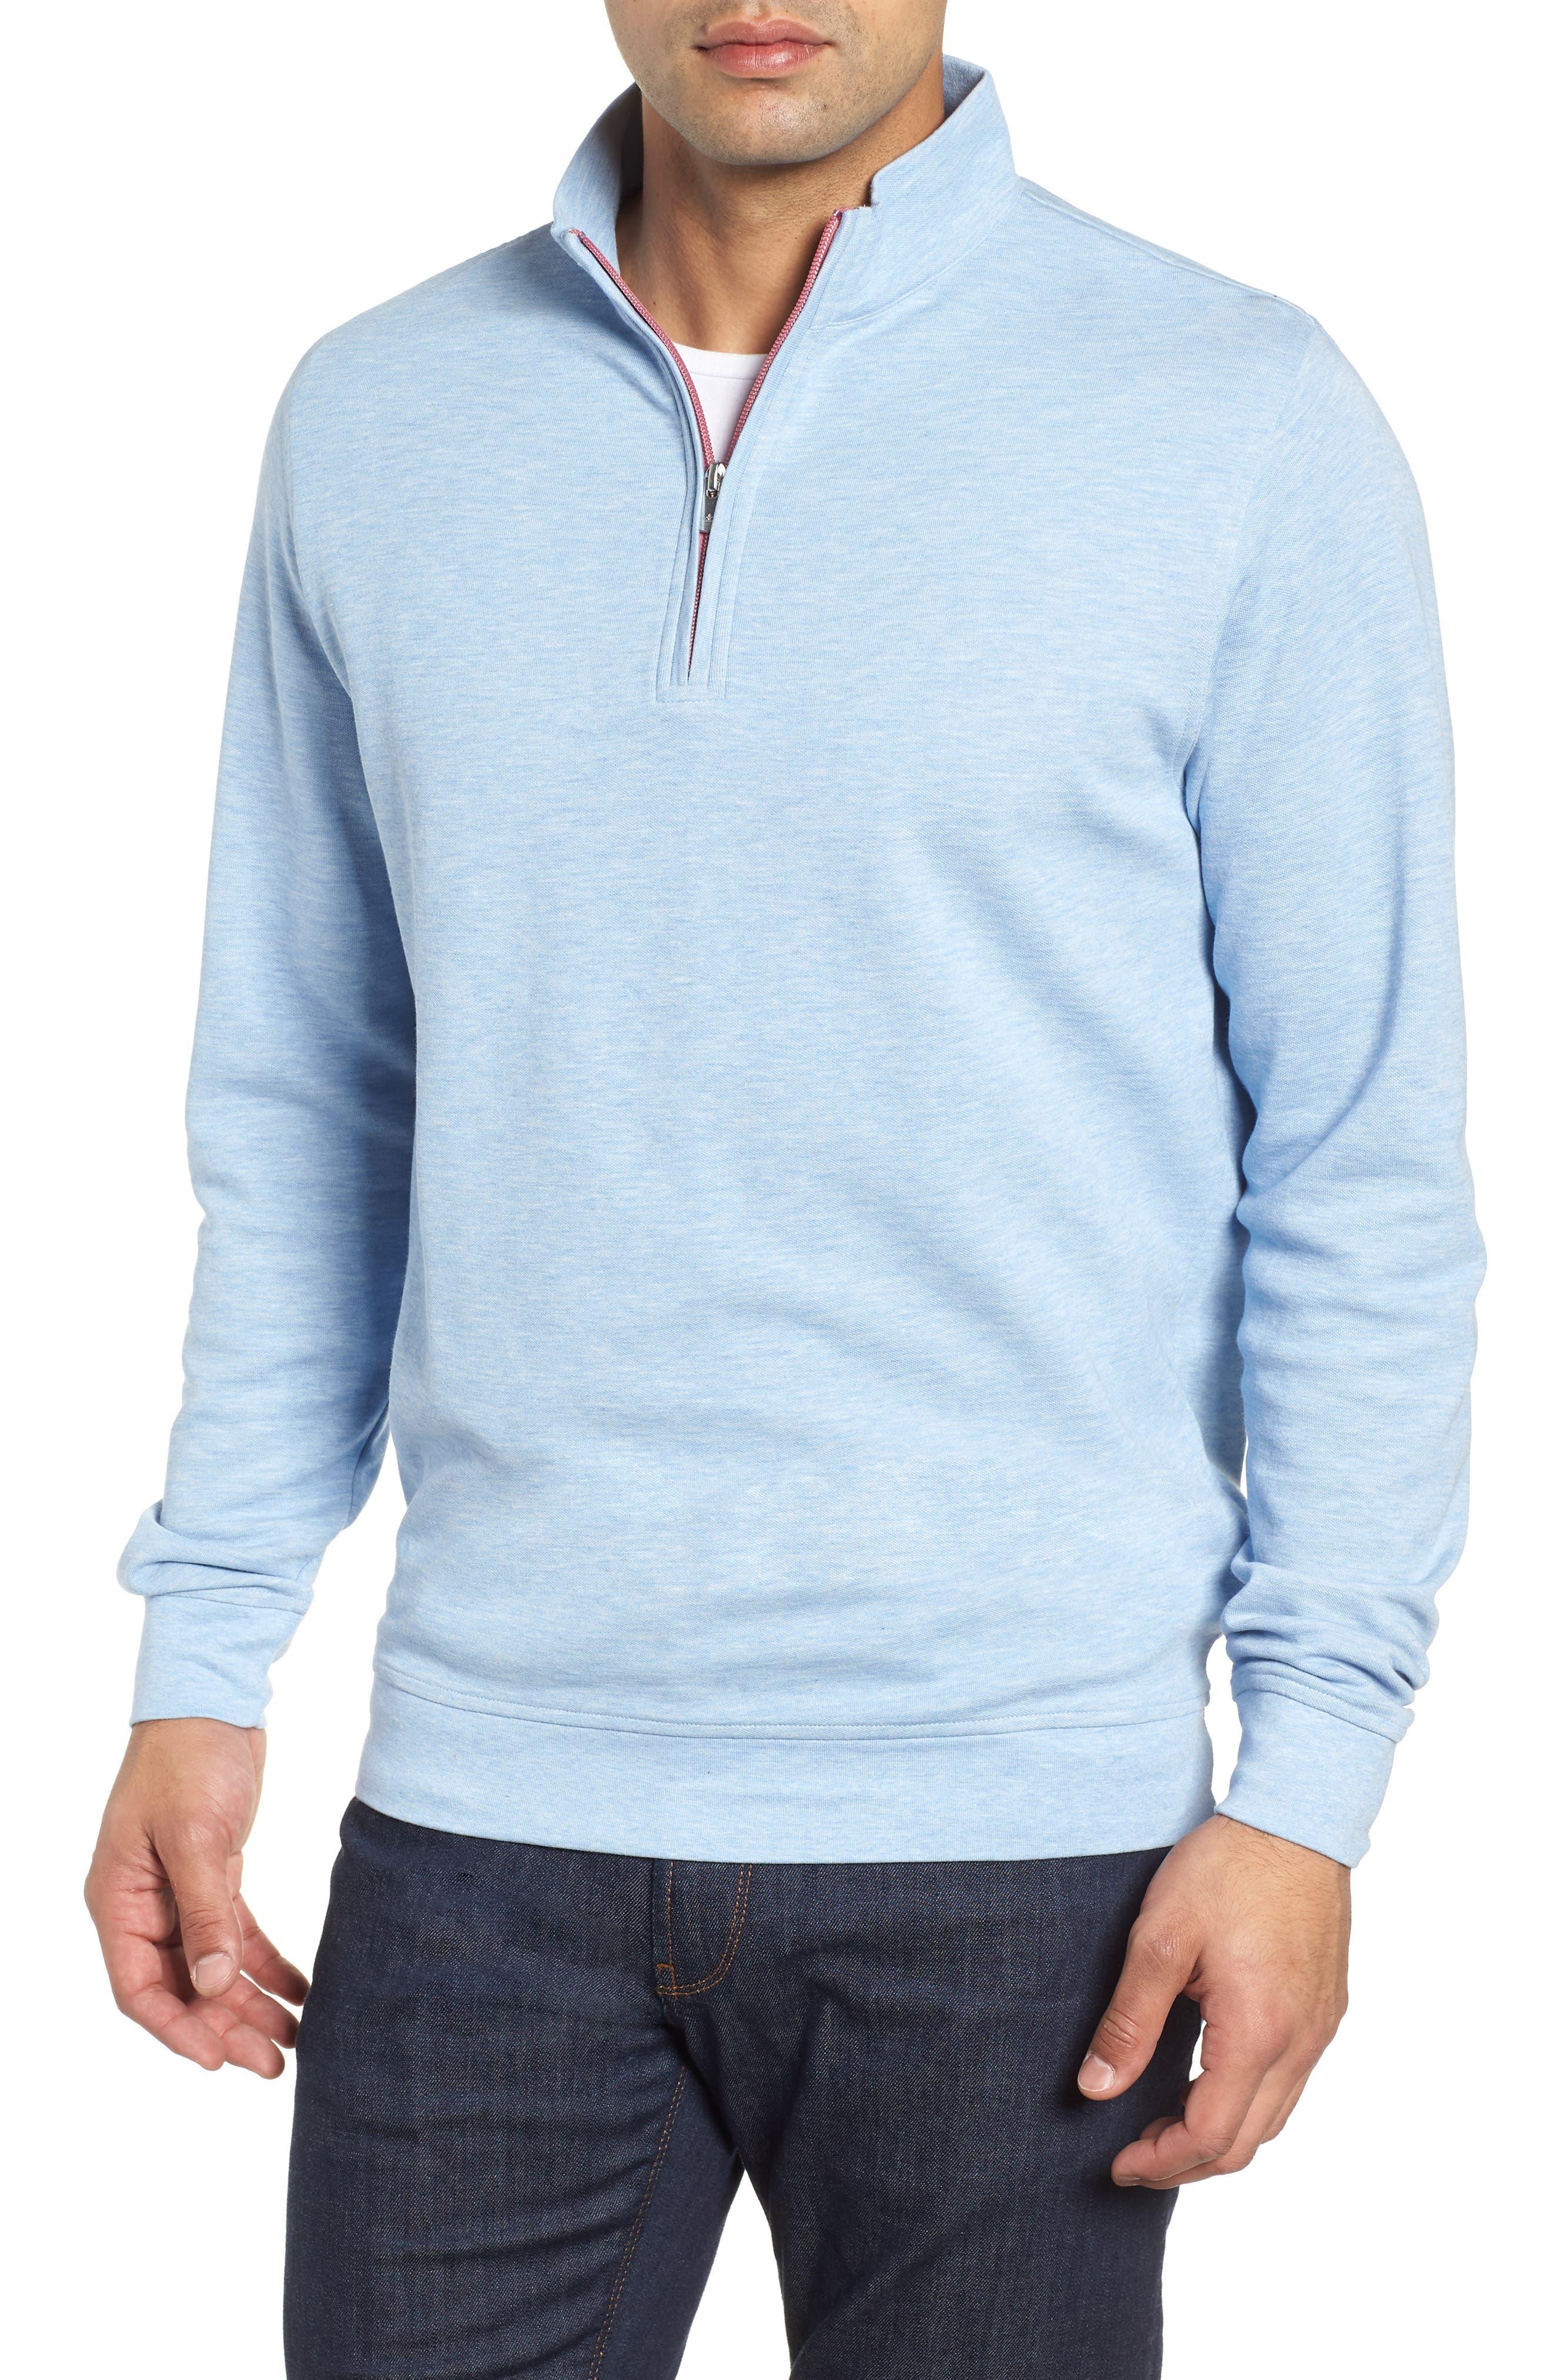 Crown Comfort Jersey Quarter Zip Pullover,                             Main thumbnail 1, color,                             COTTAGE BLUE